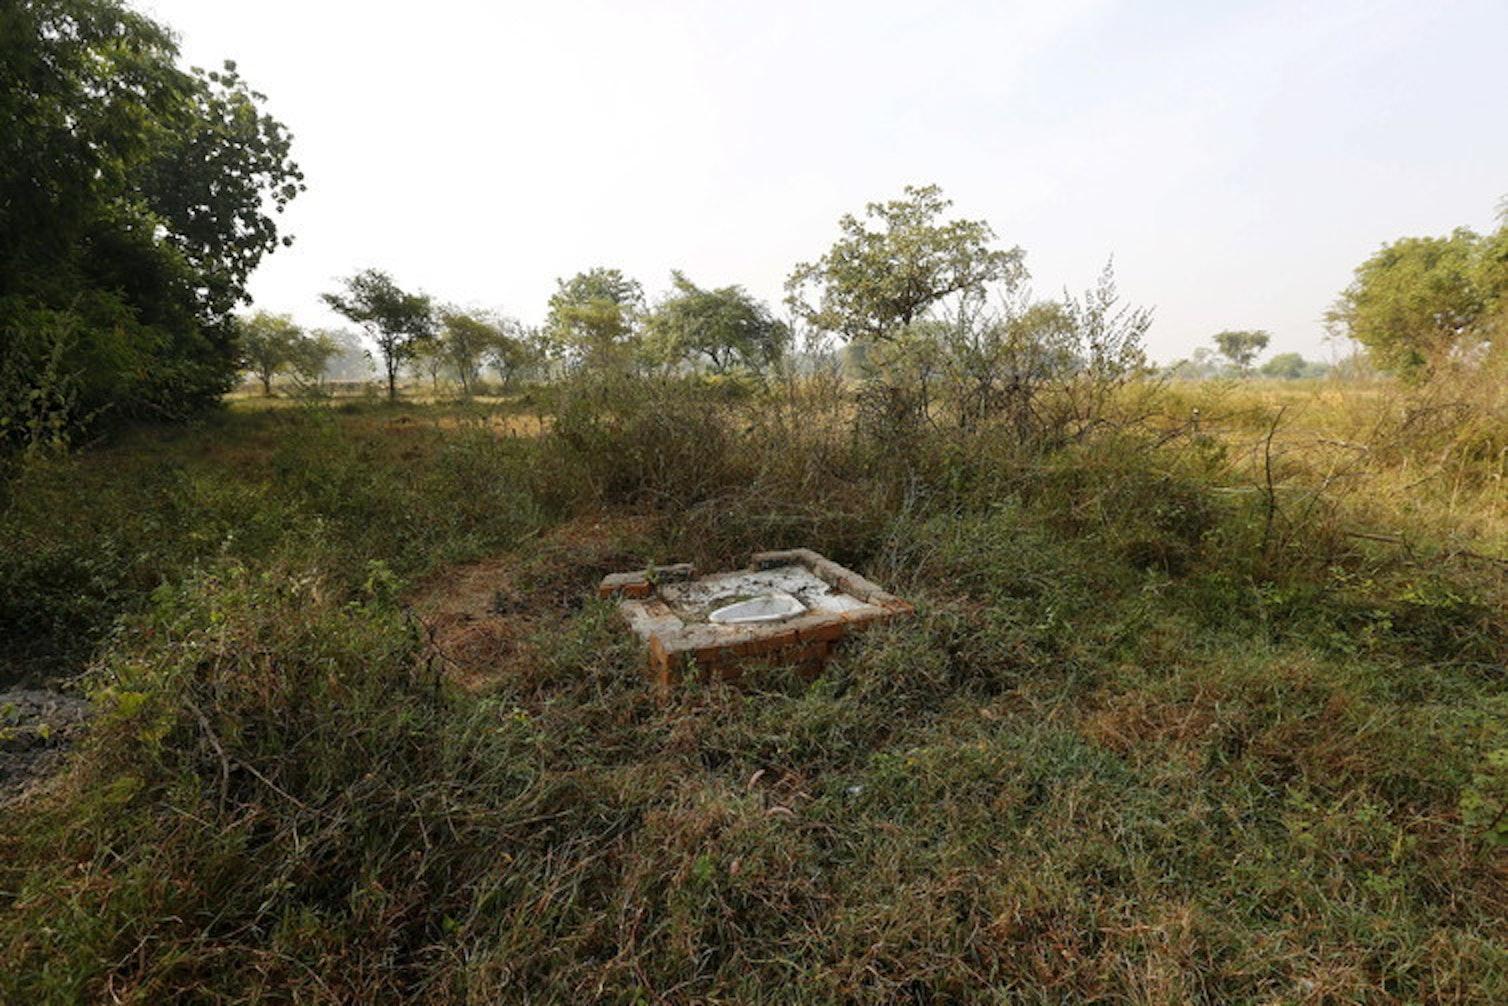 Open defecation spot in rural Chhattisgarh, central India.